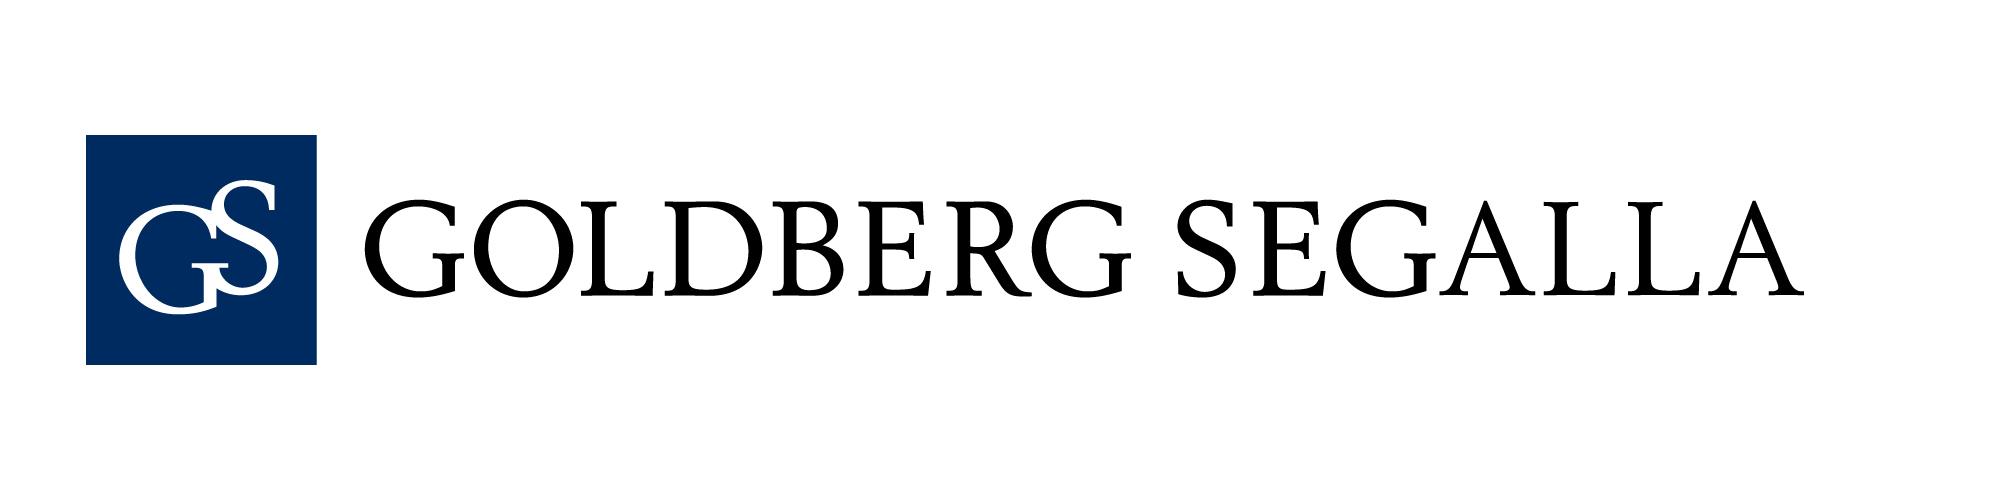 Goldberg Segalla logo